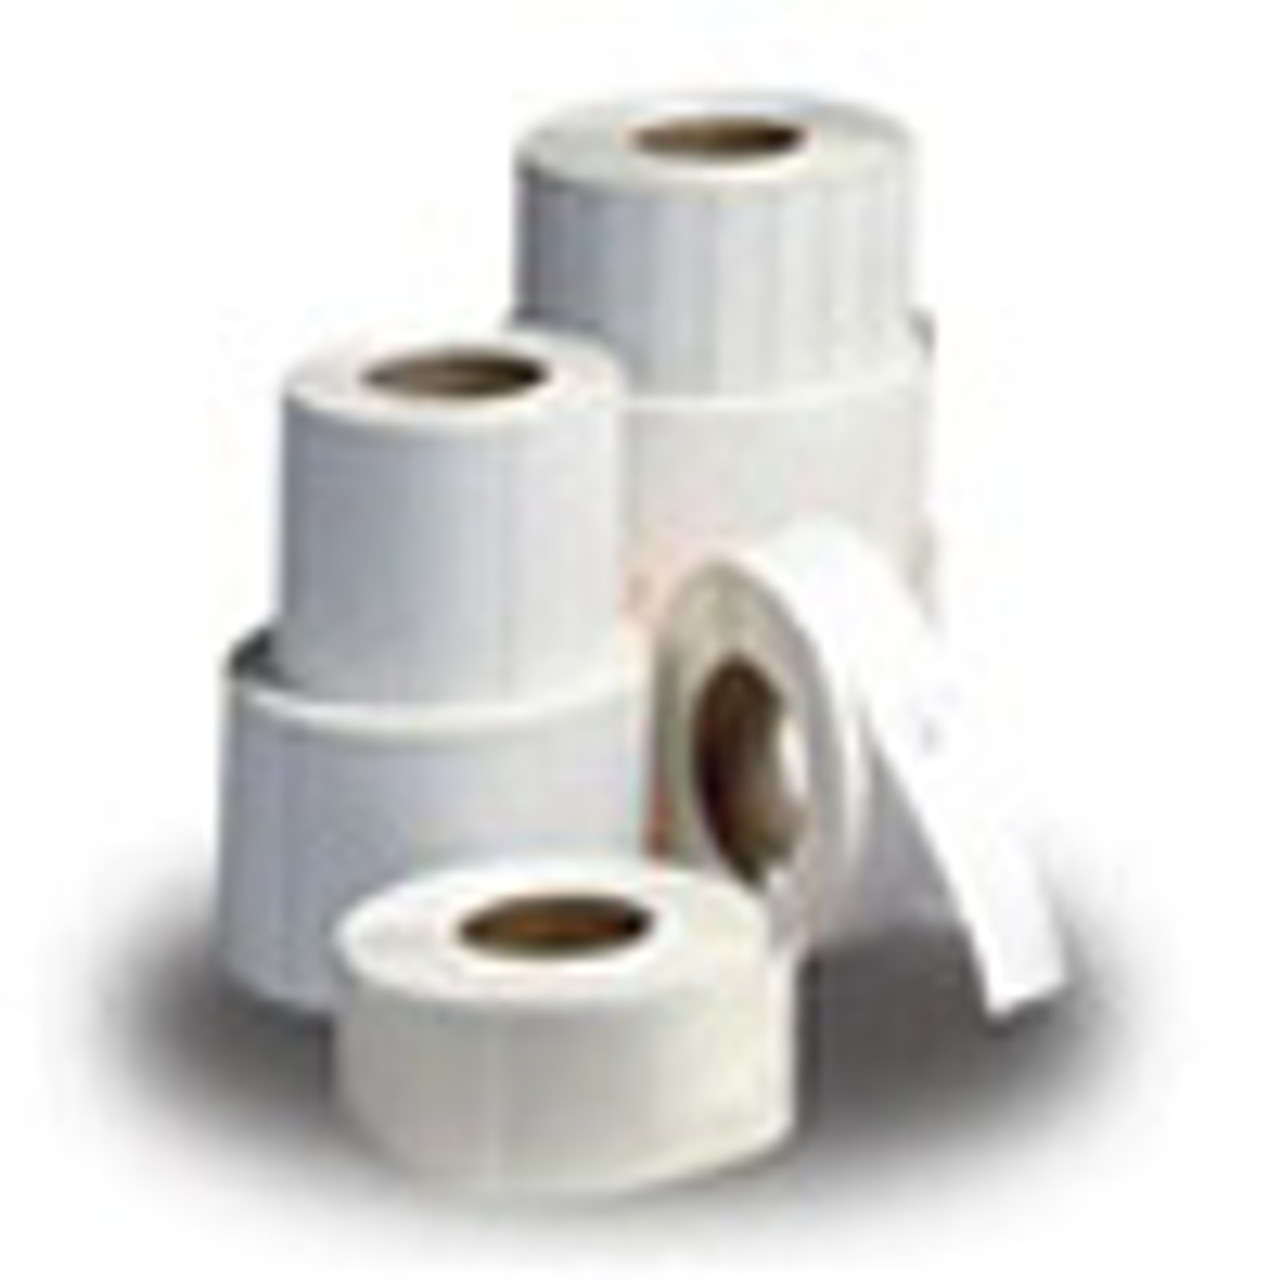 KR403 Receipt Paper